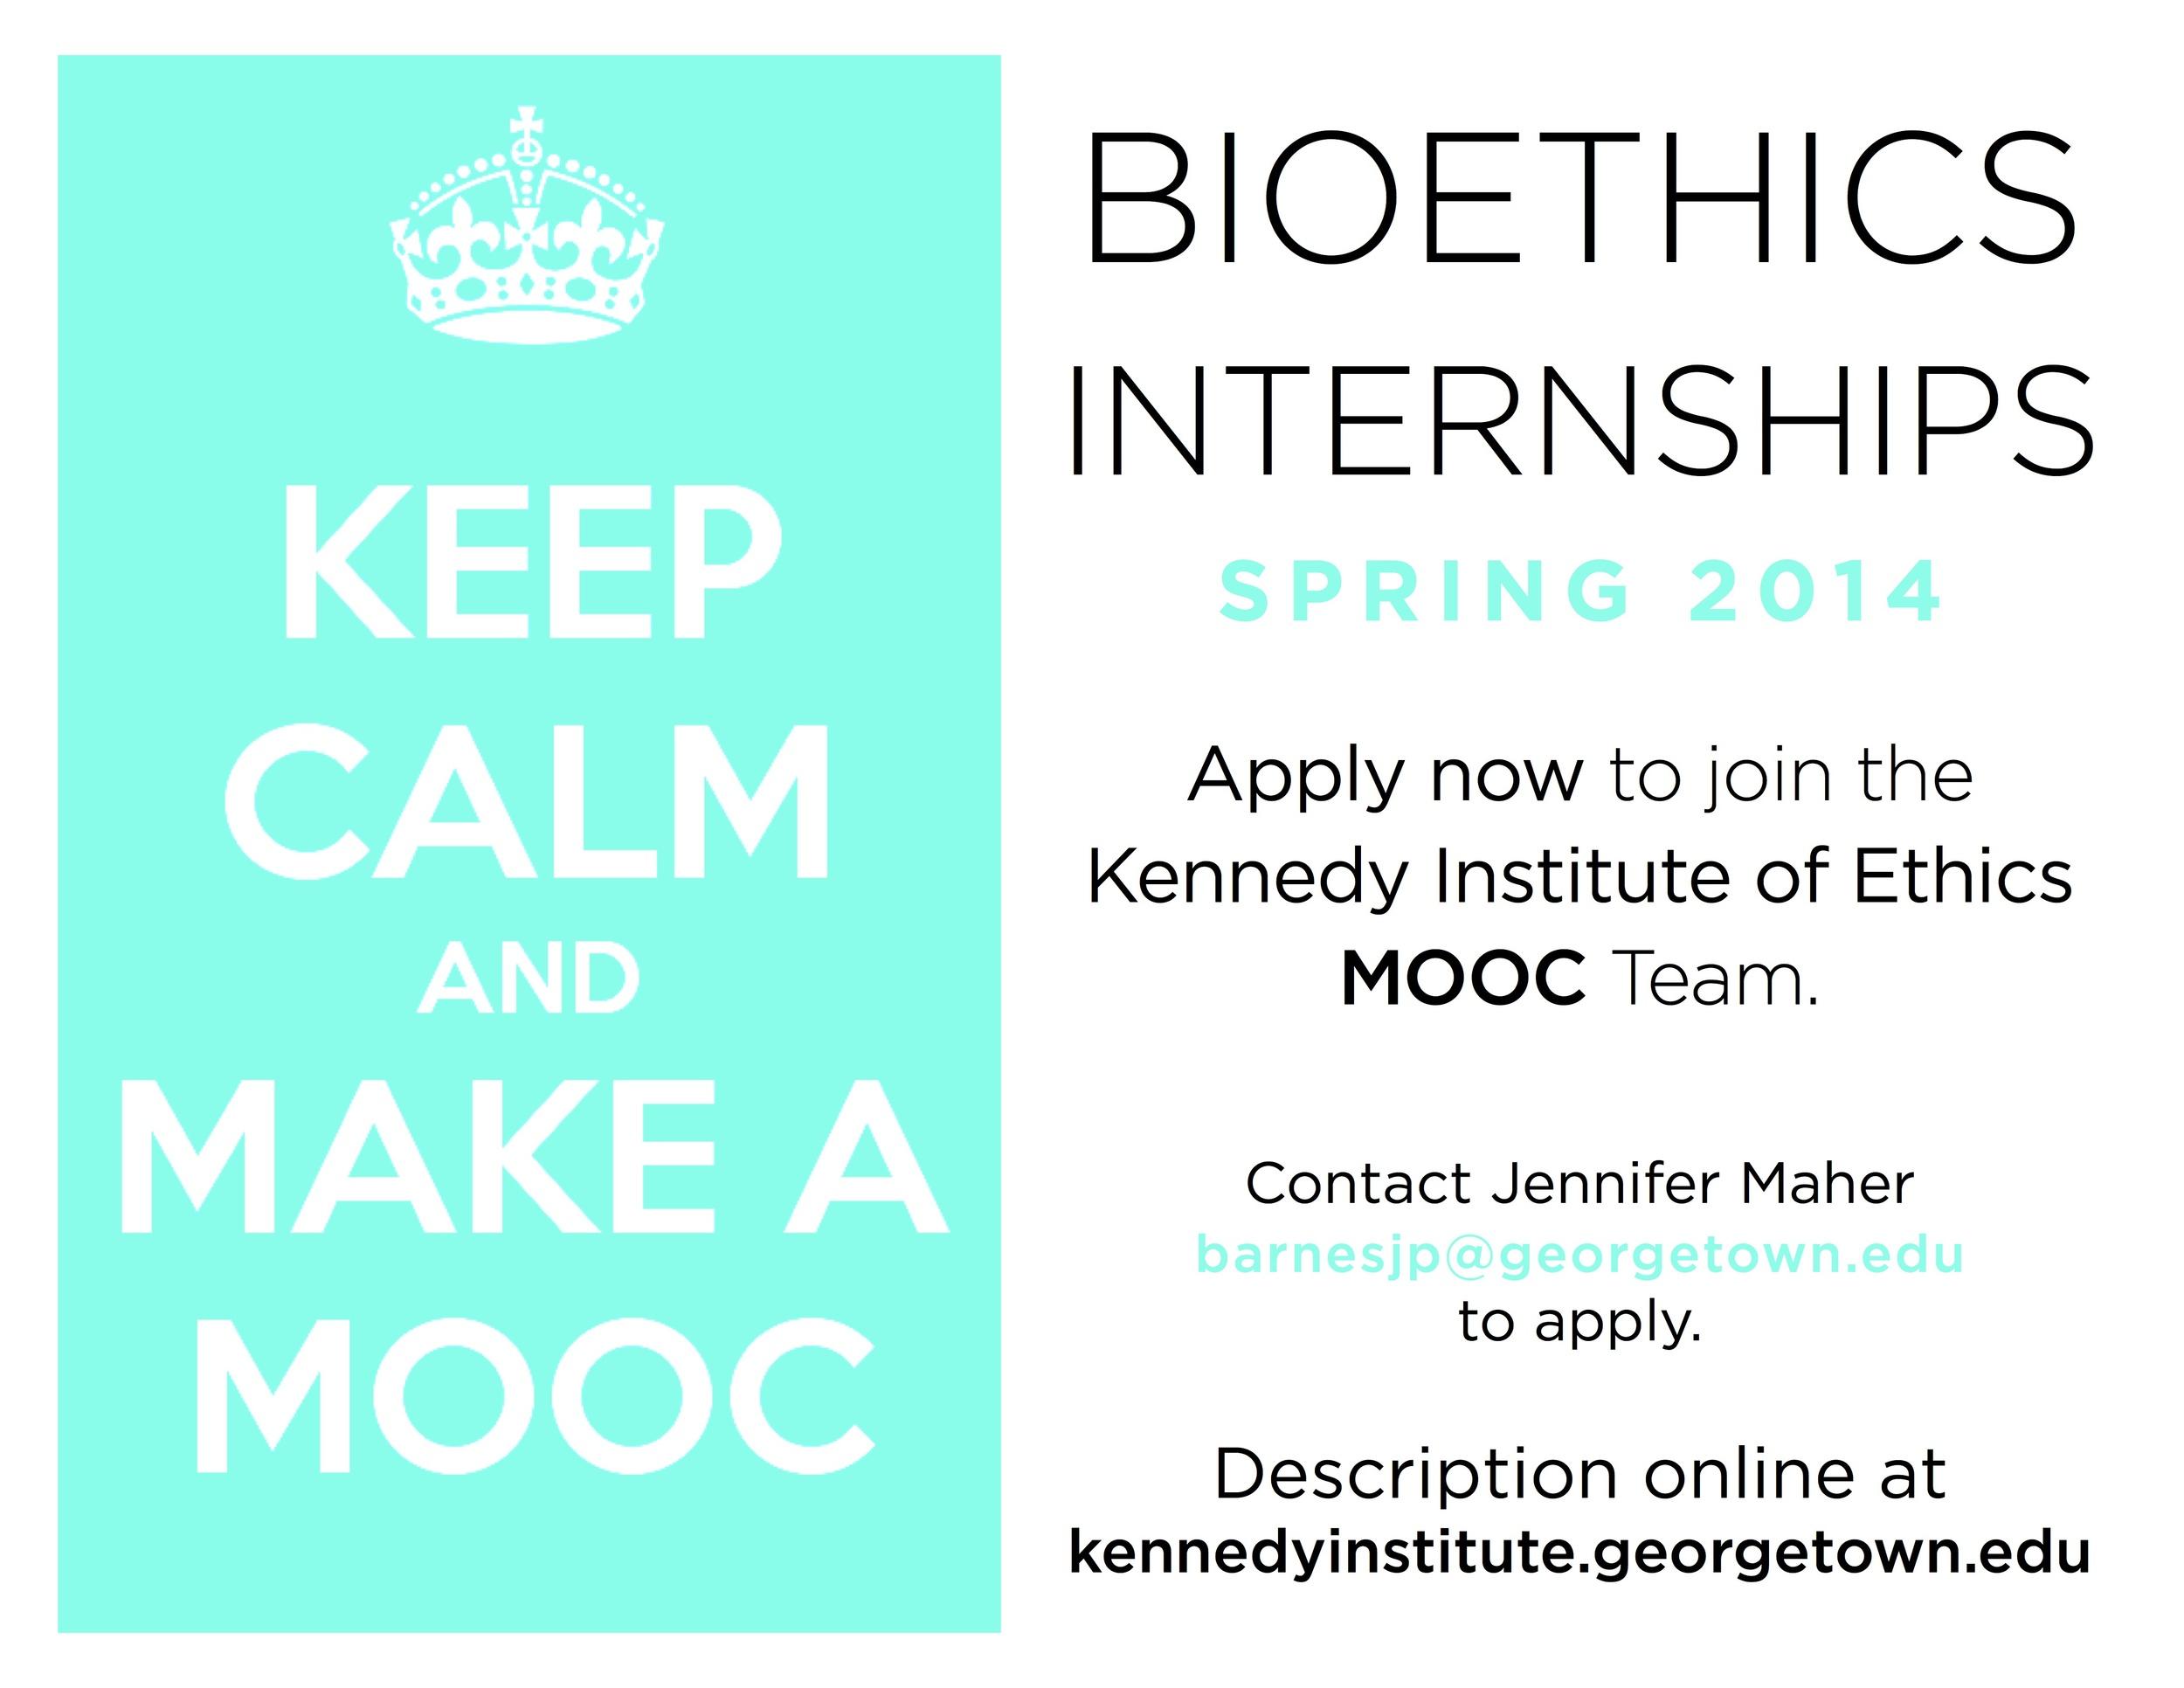 Bioethics MOOC Internships Poster 1 - Keep Calm.jpg